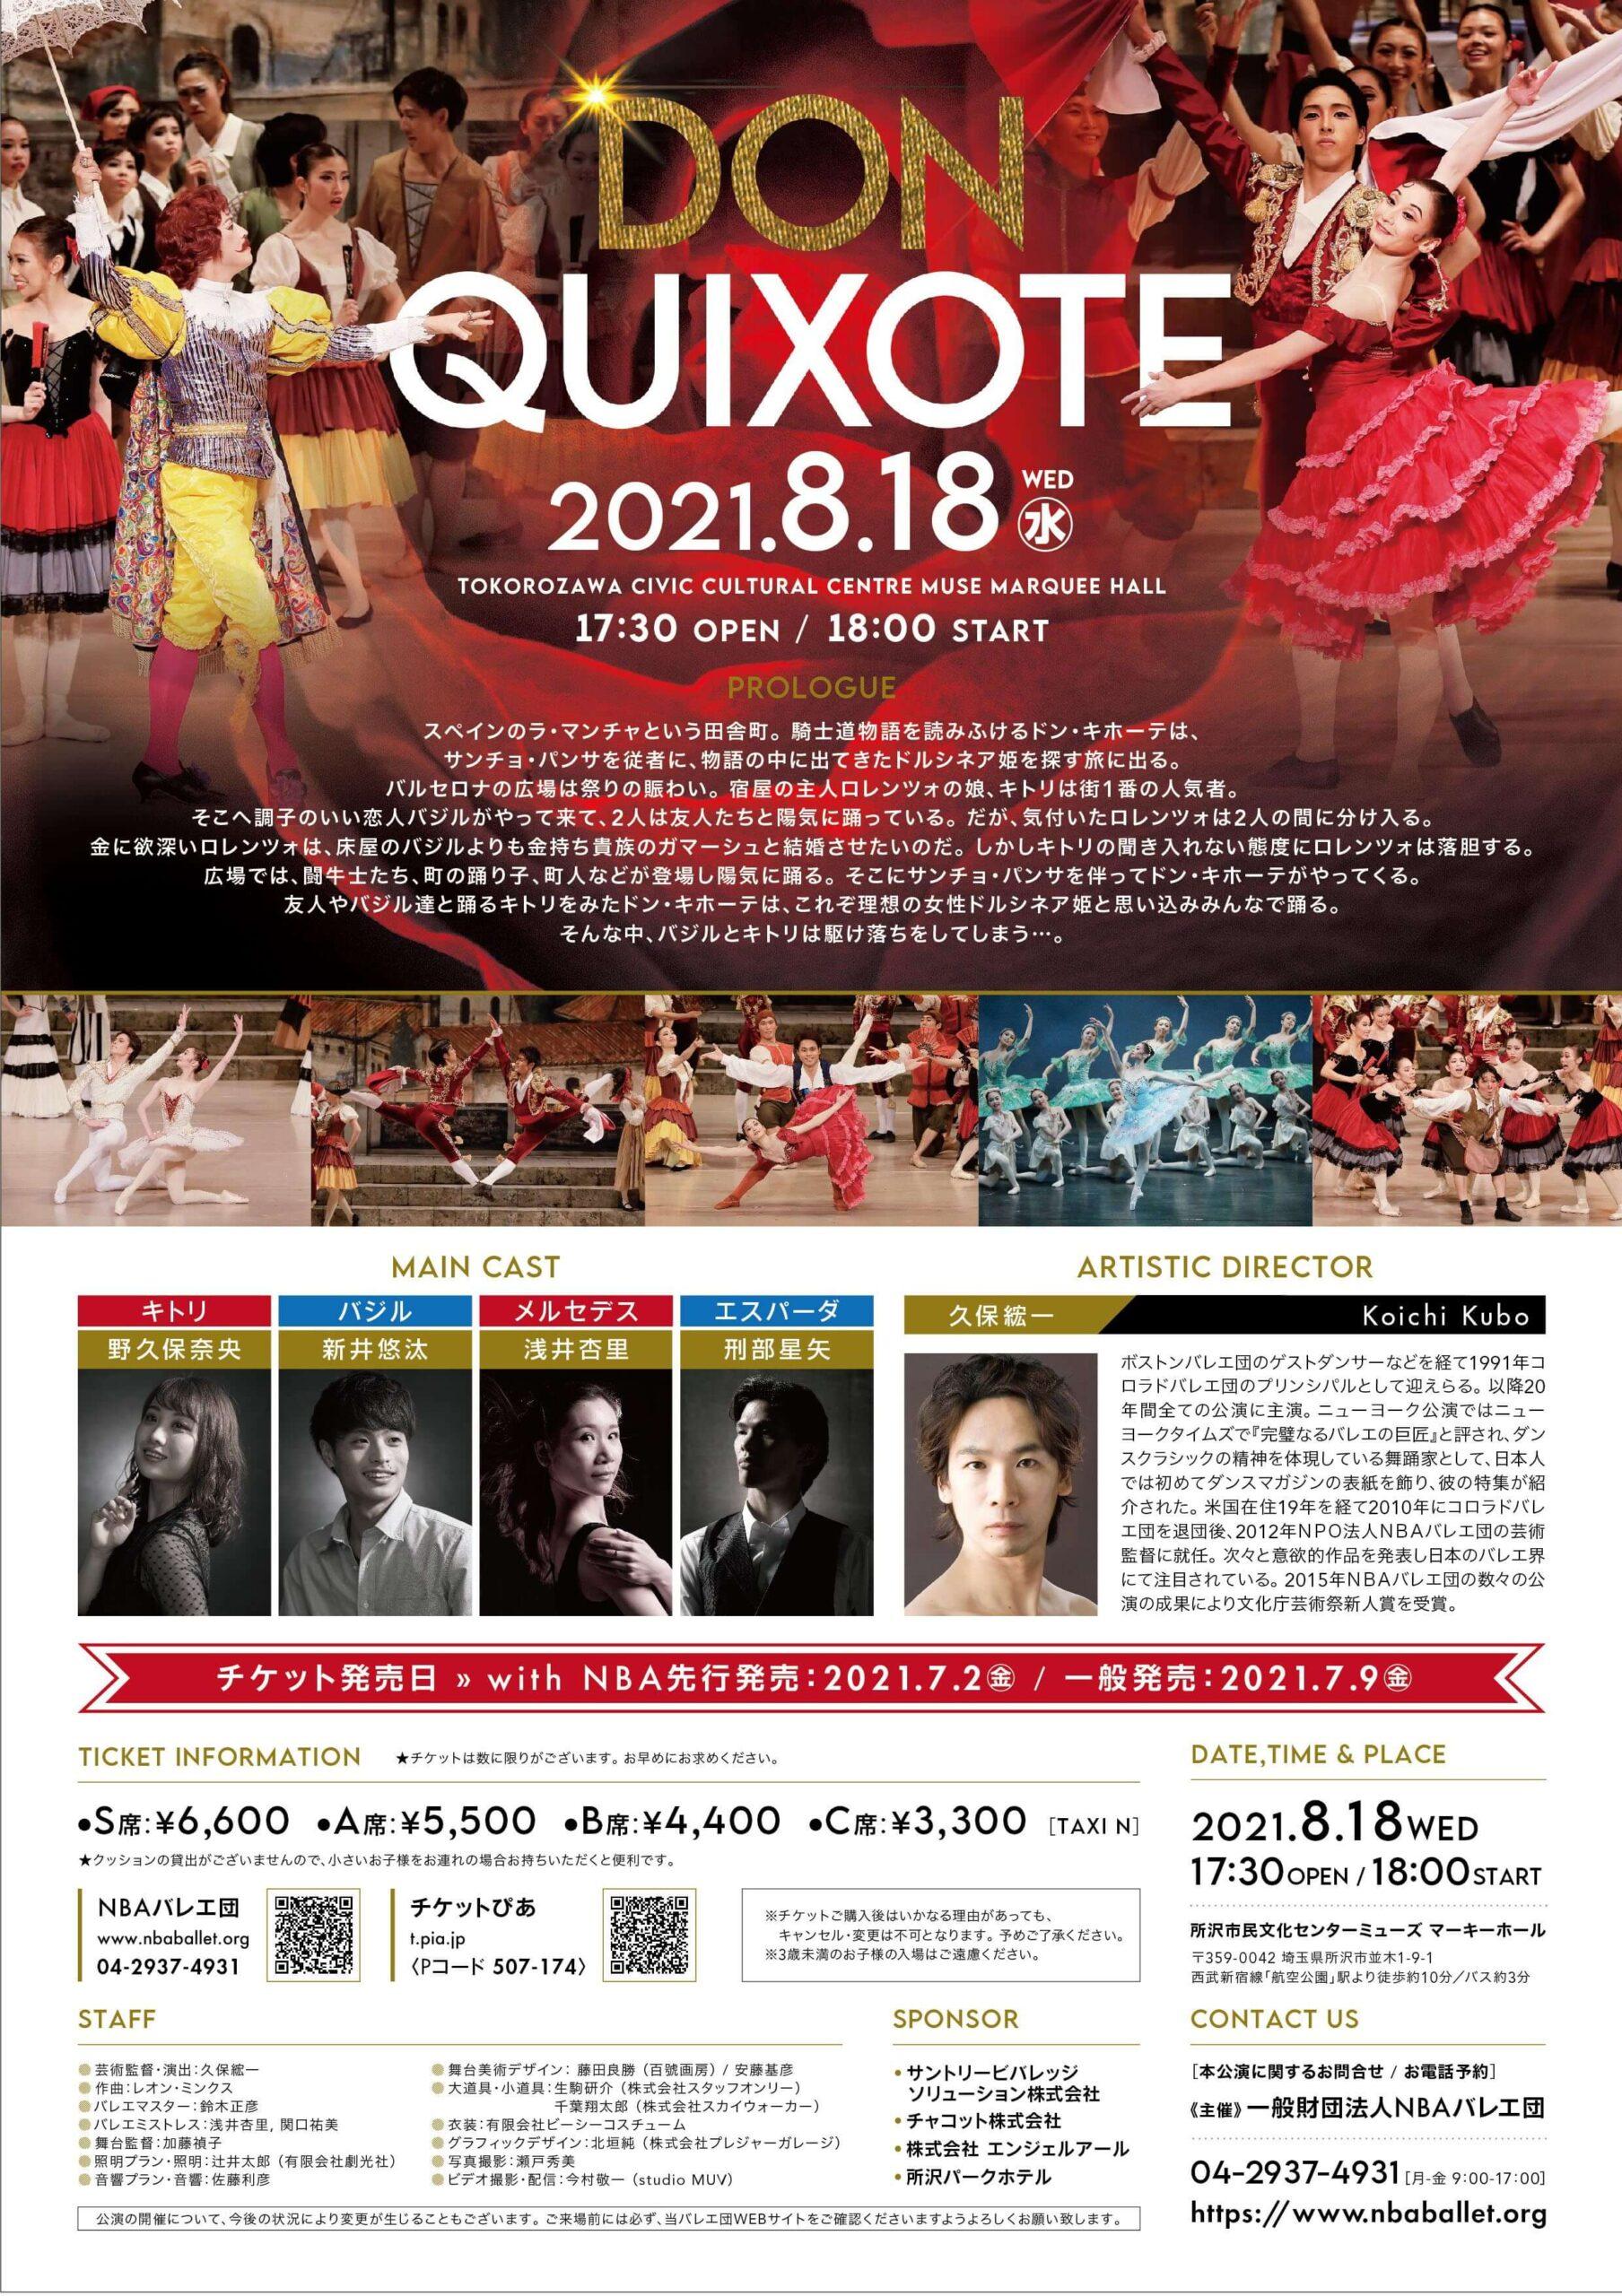 NBAバレエ団公演 夏休み所沢バレエFESTIVAL ドン・キホーテ